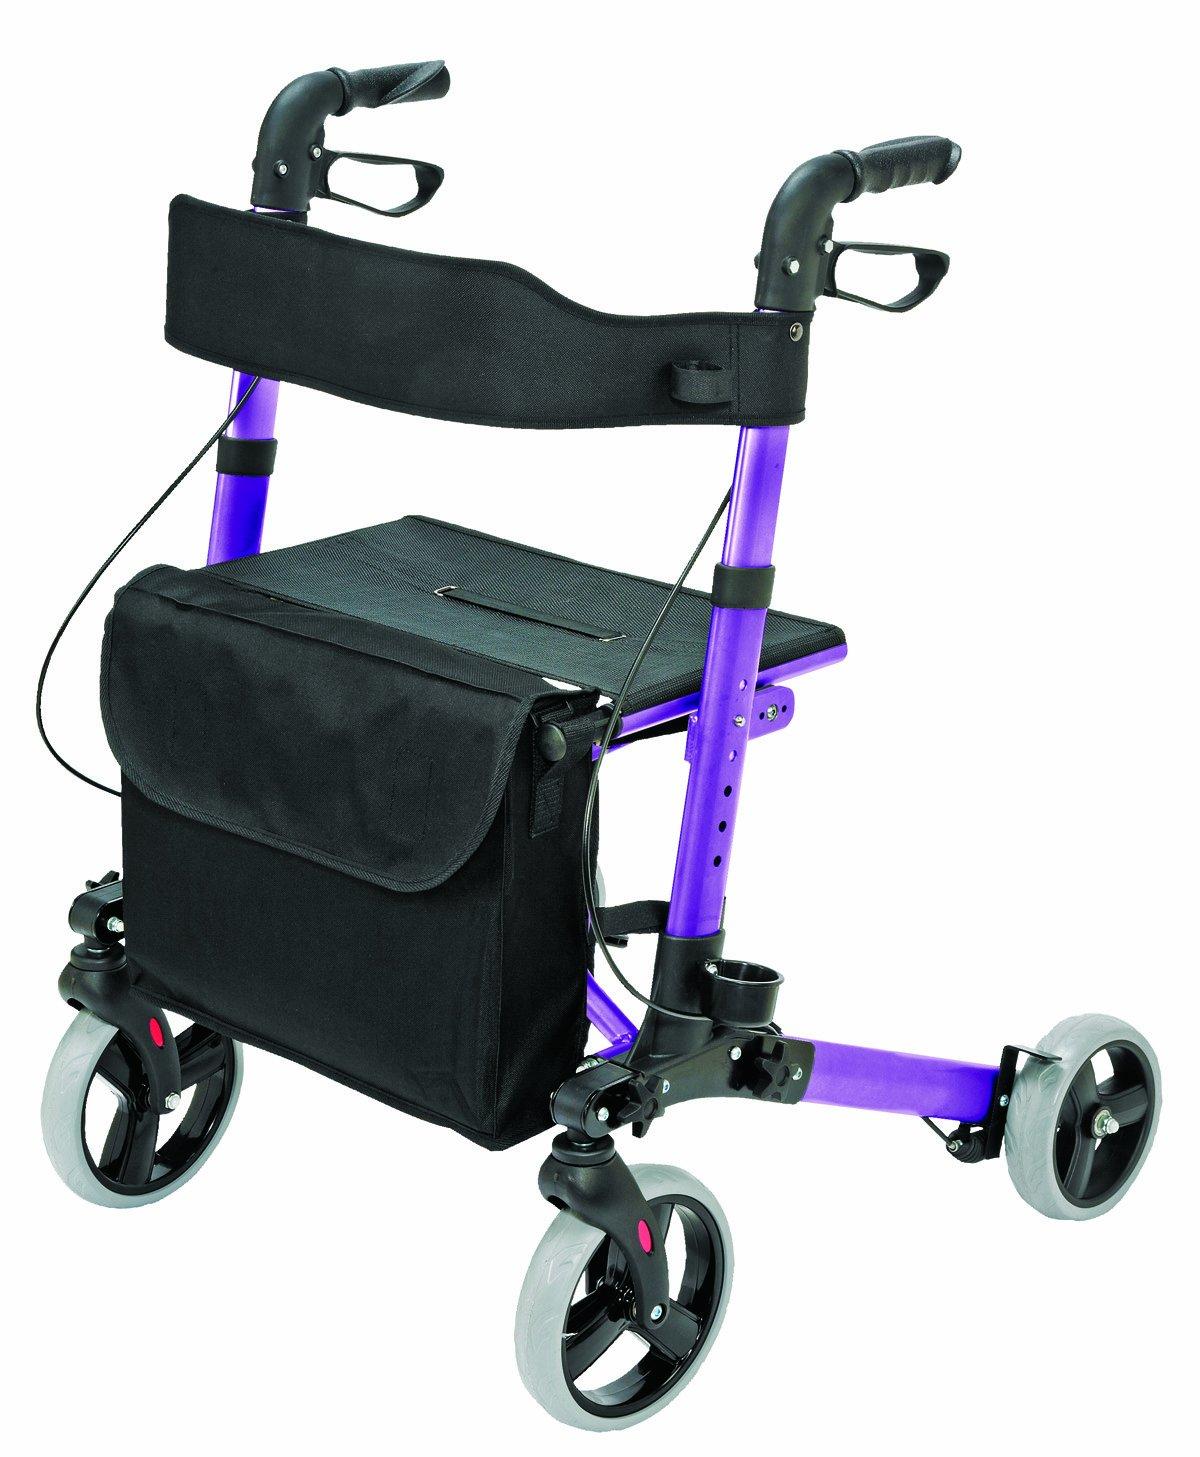 4 Wheel Rollator Walker with Seat - Medical Walker for Seniors, Euro Style Rollator, Compact Folding Walker, Lightweight Aluminum Walker, Purple